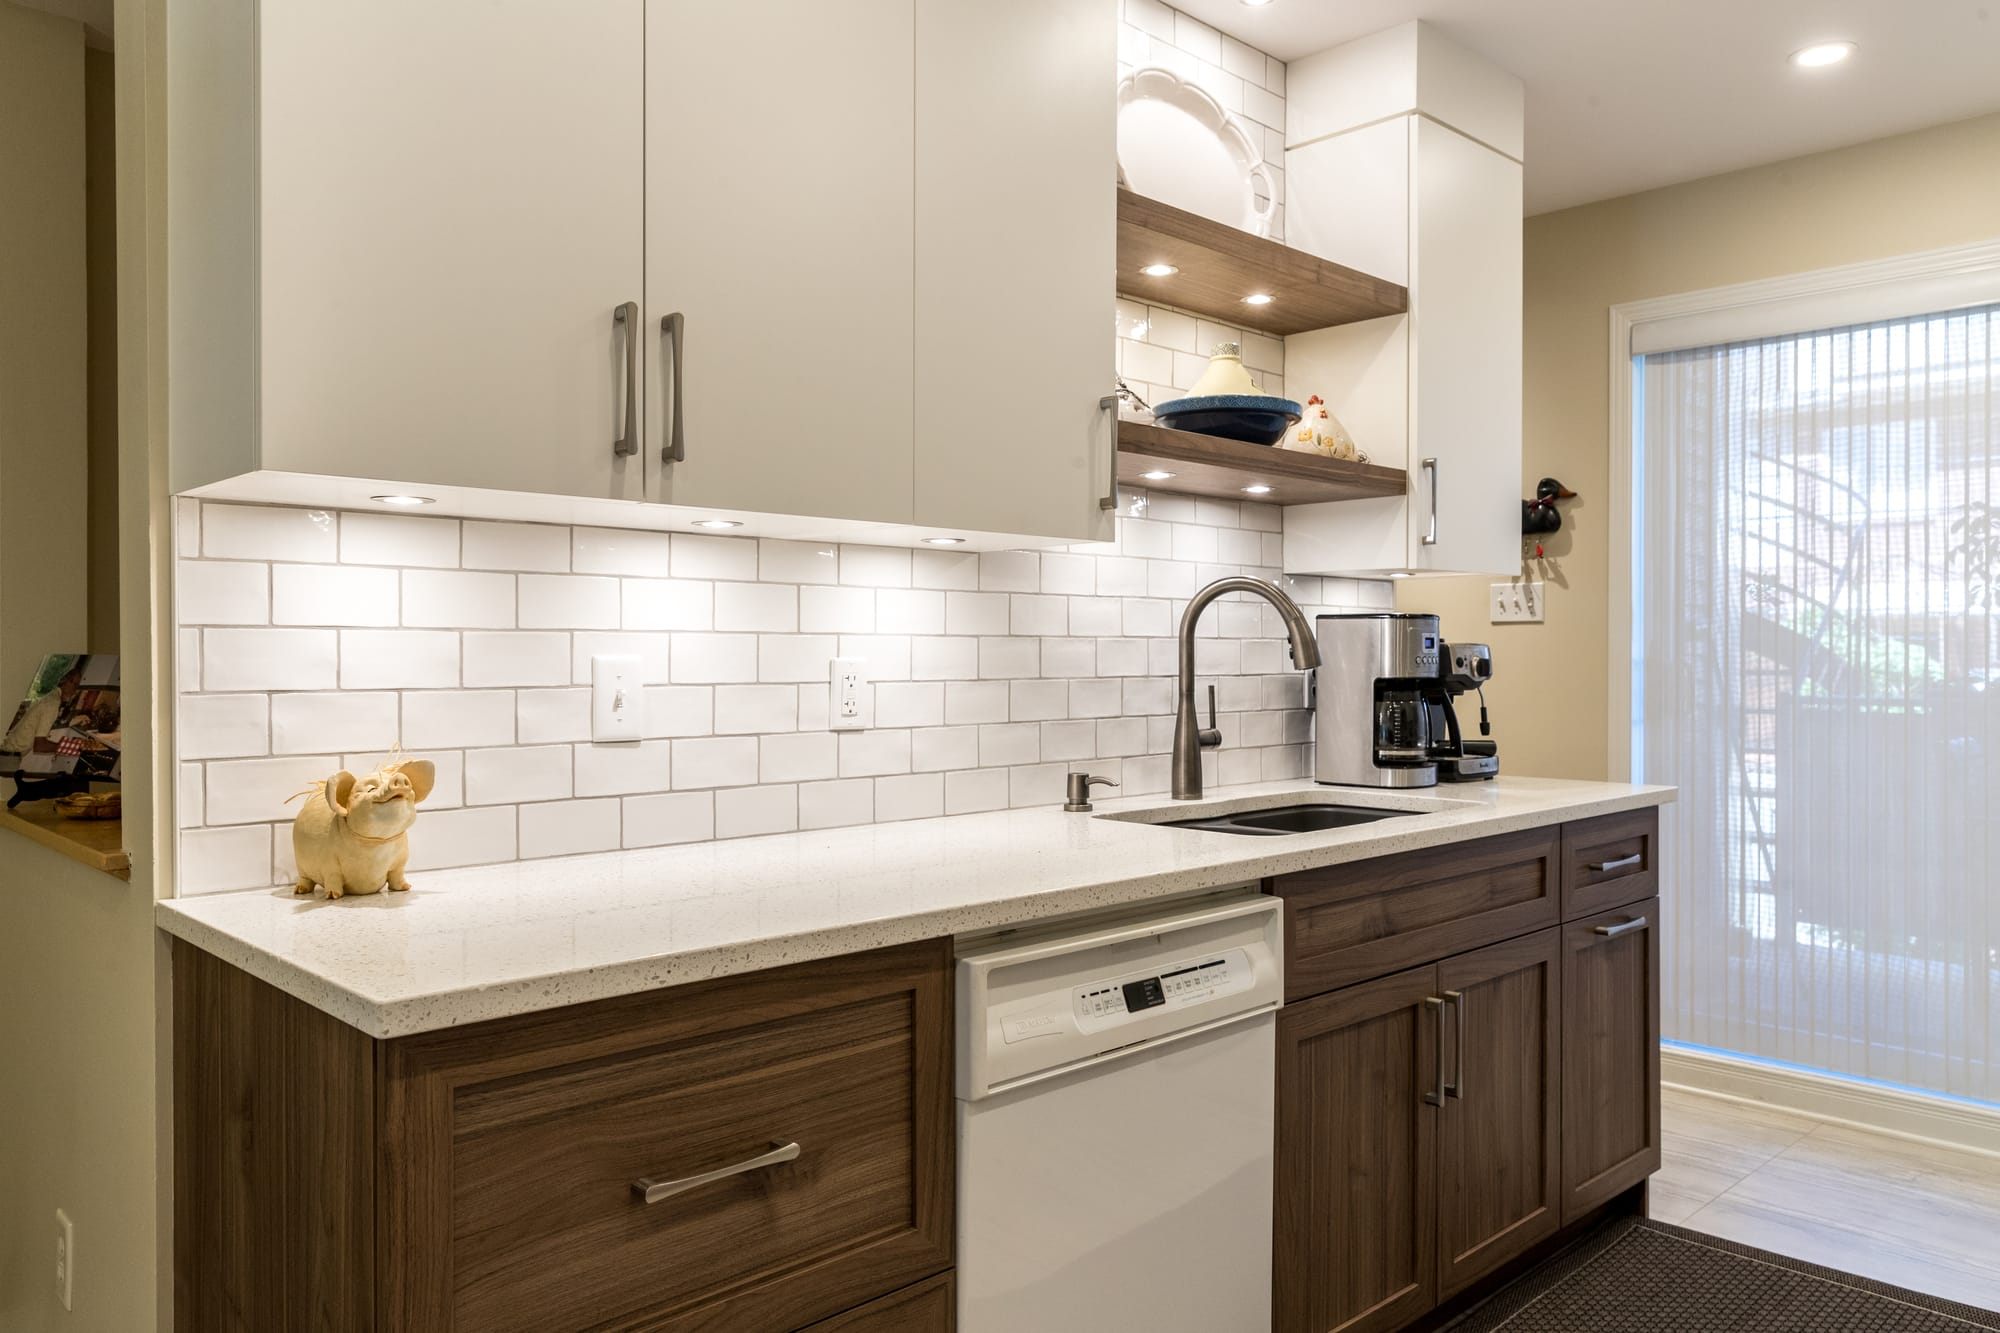 two tone kitchen with a quartz countertop